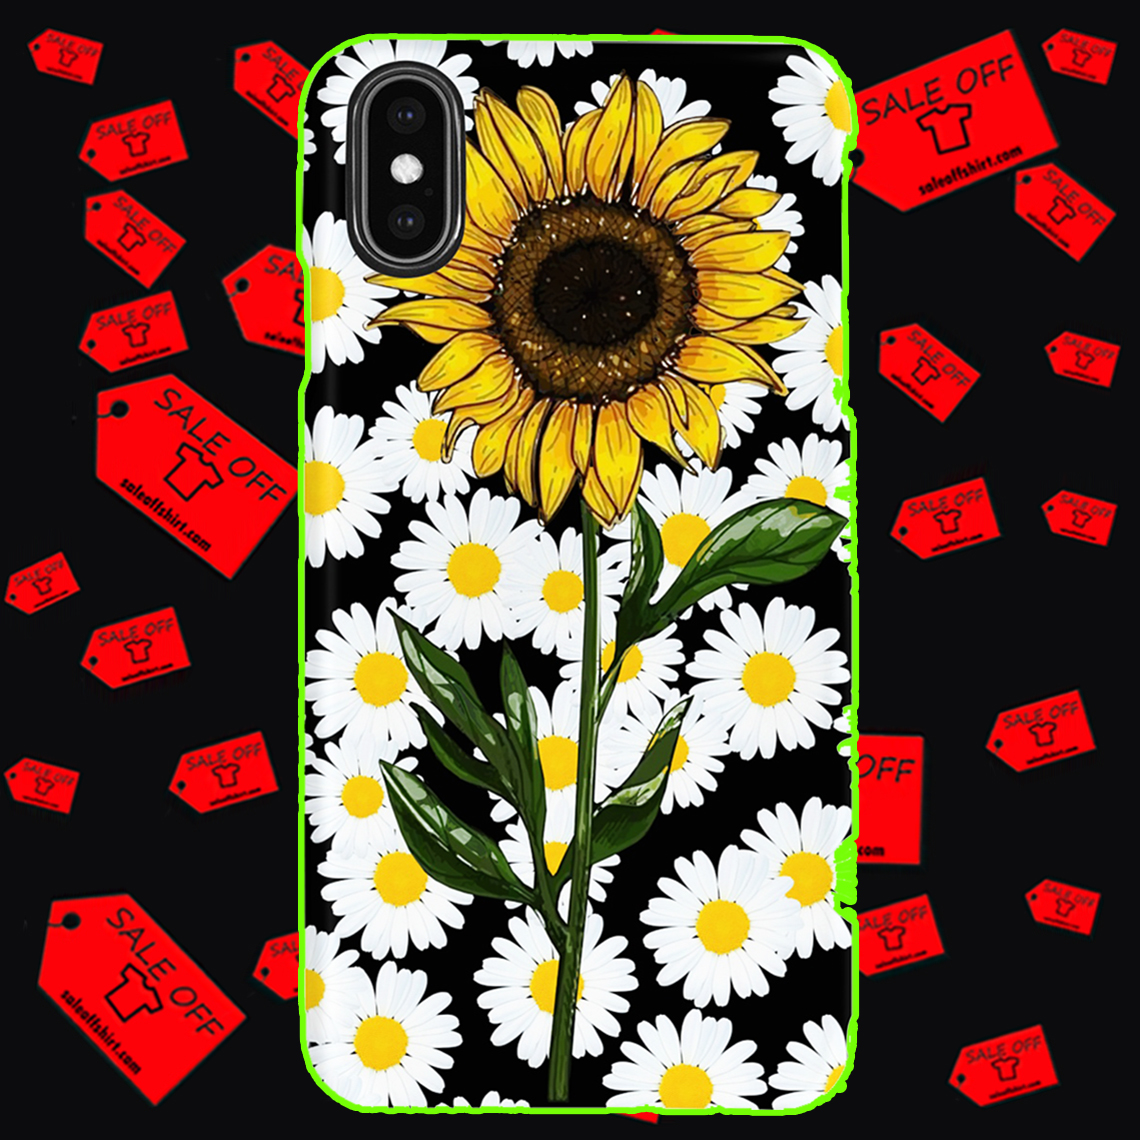 Sunflower daisy phone case - Iphone XS Max case